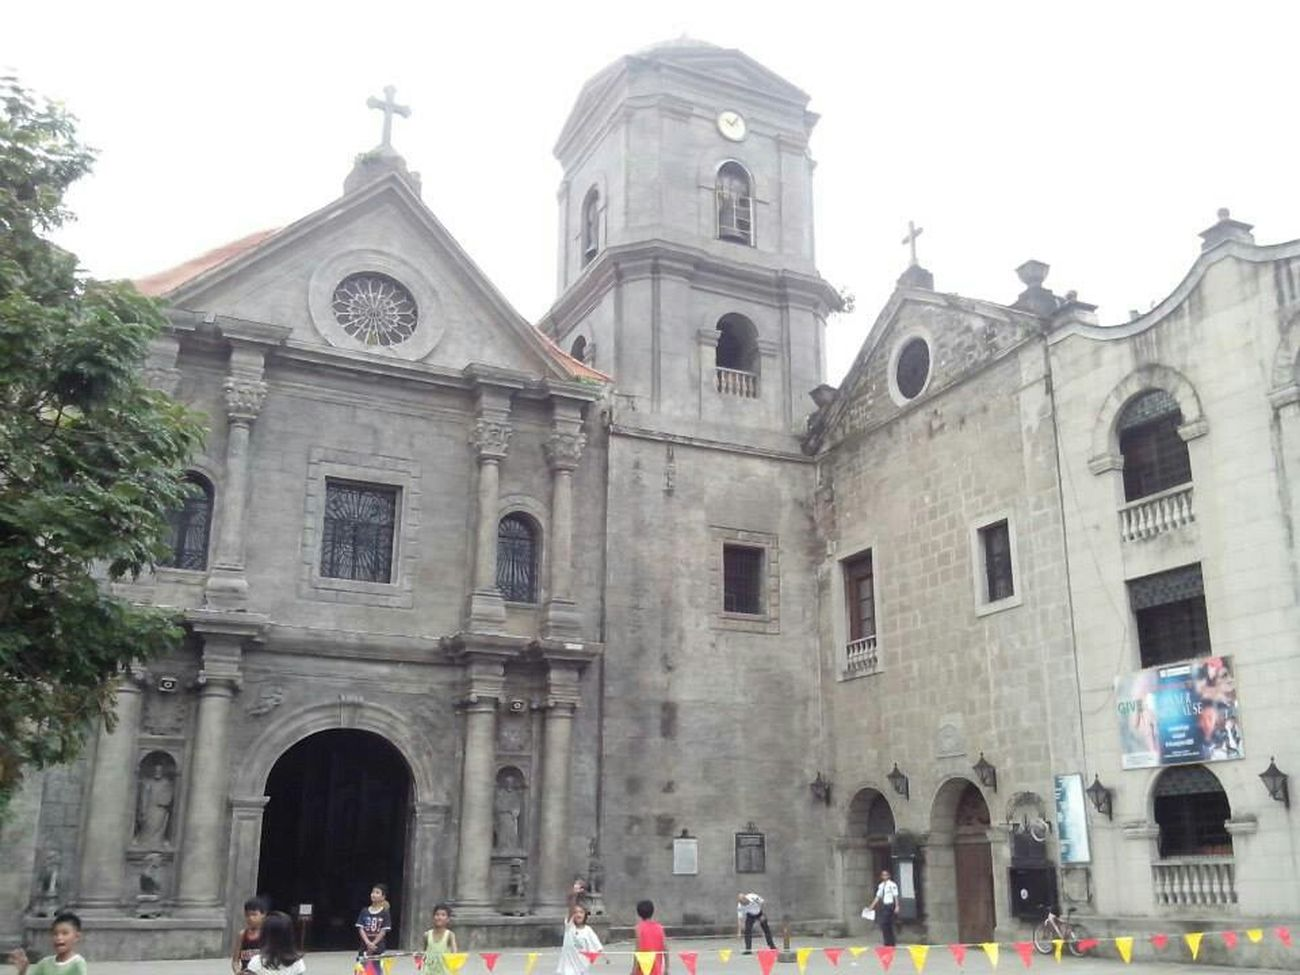 5MP Alcatel One Touch 5021E Churches Intramuros San Agustin Church Mobile Photography Biking By…